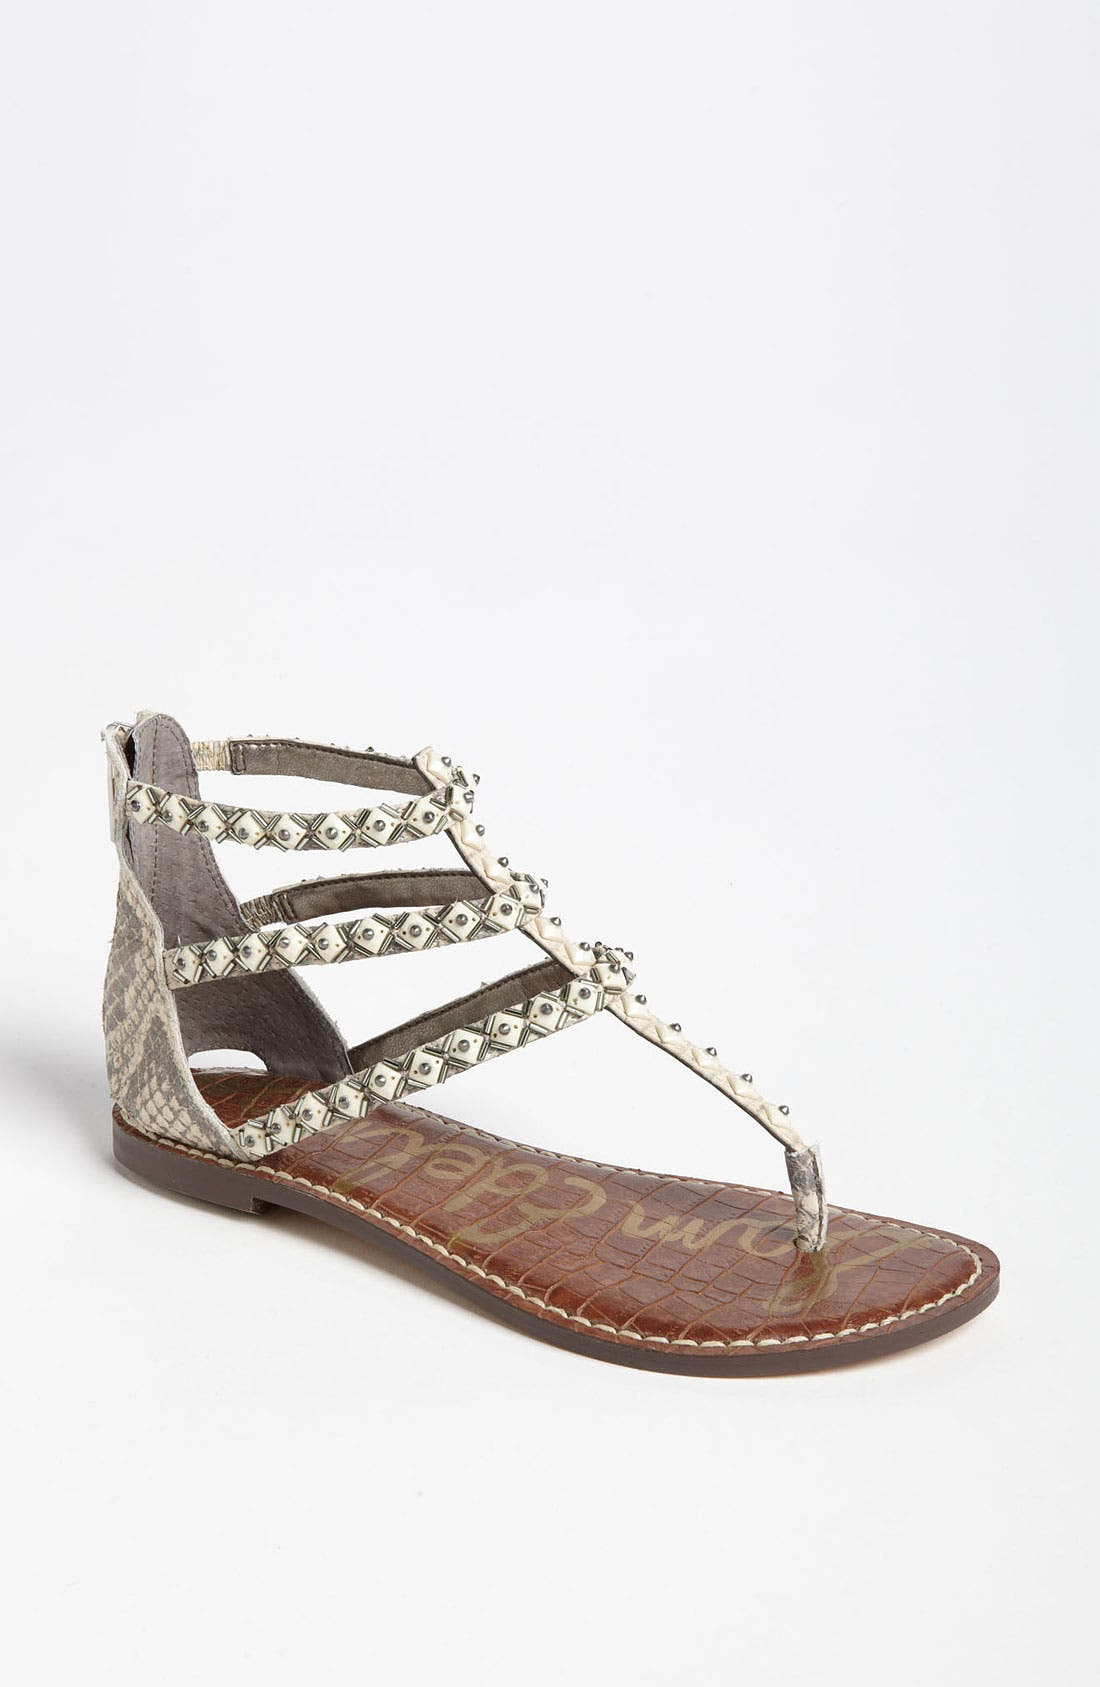 Alternate Image 1 Selected - Sam Edelman 'Greyson' Sandal